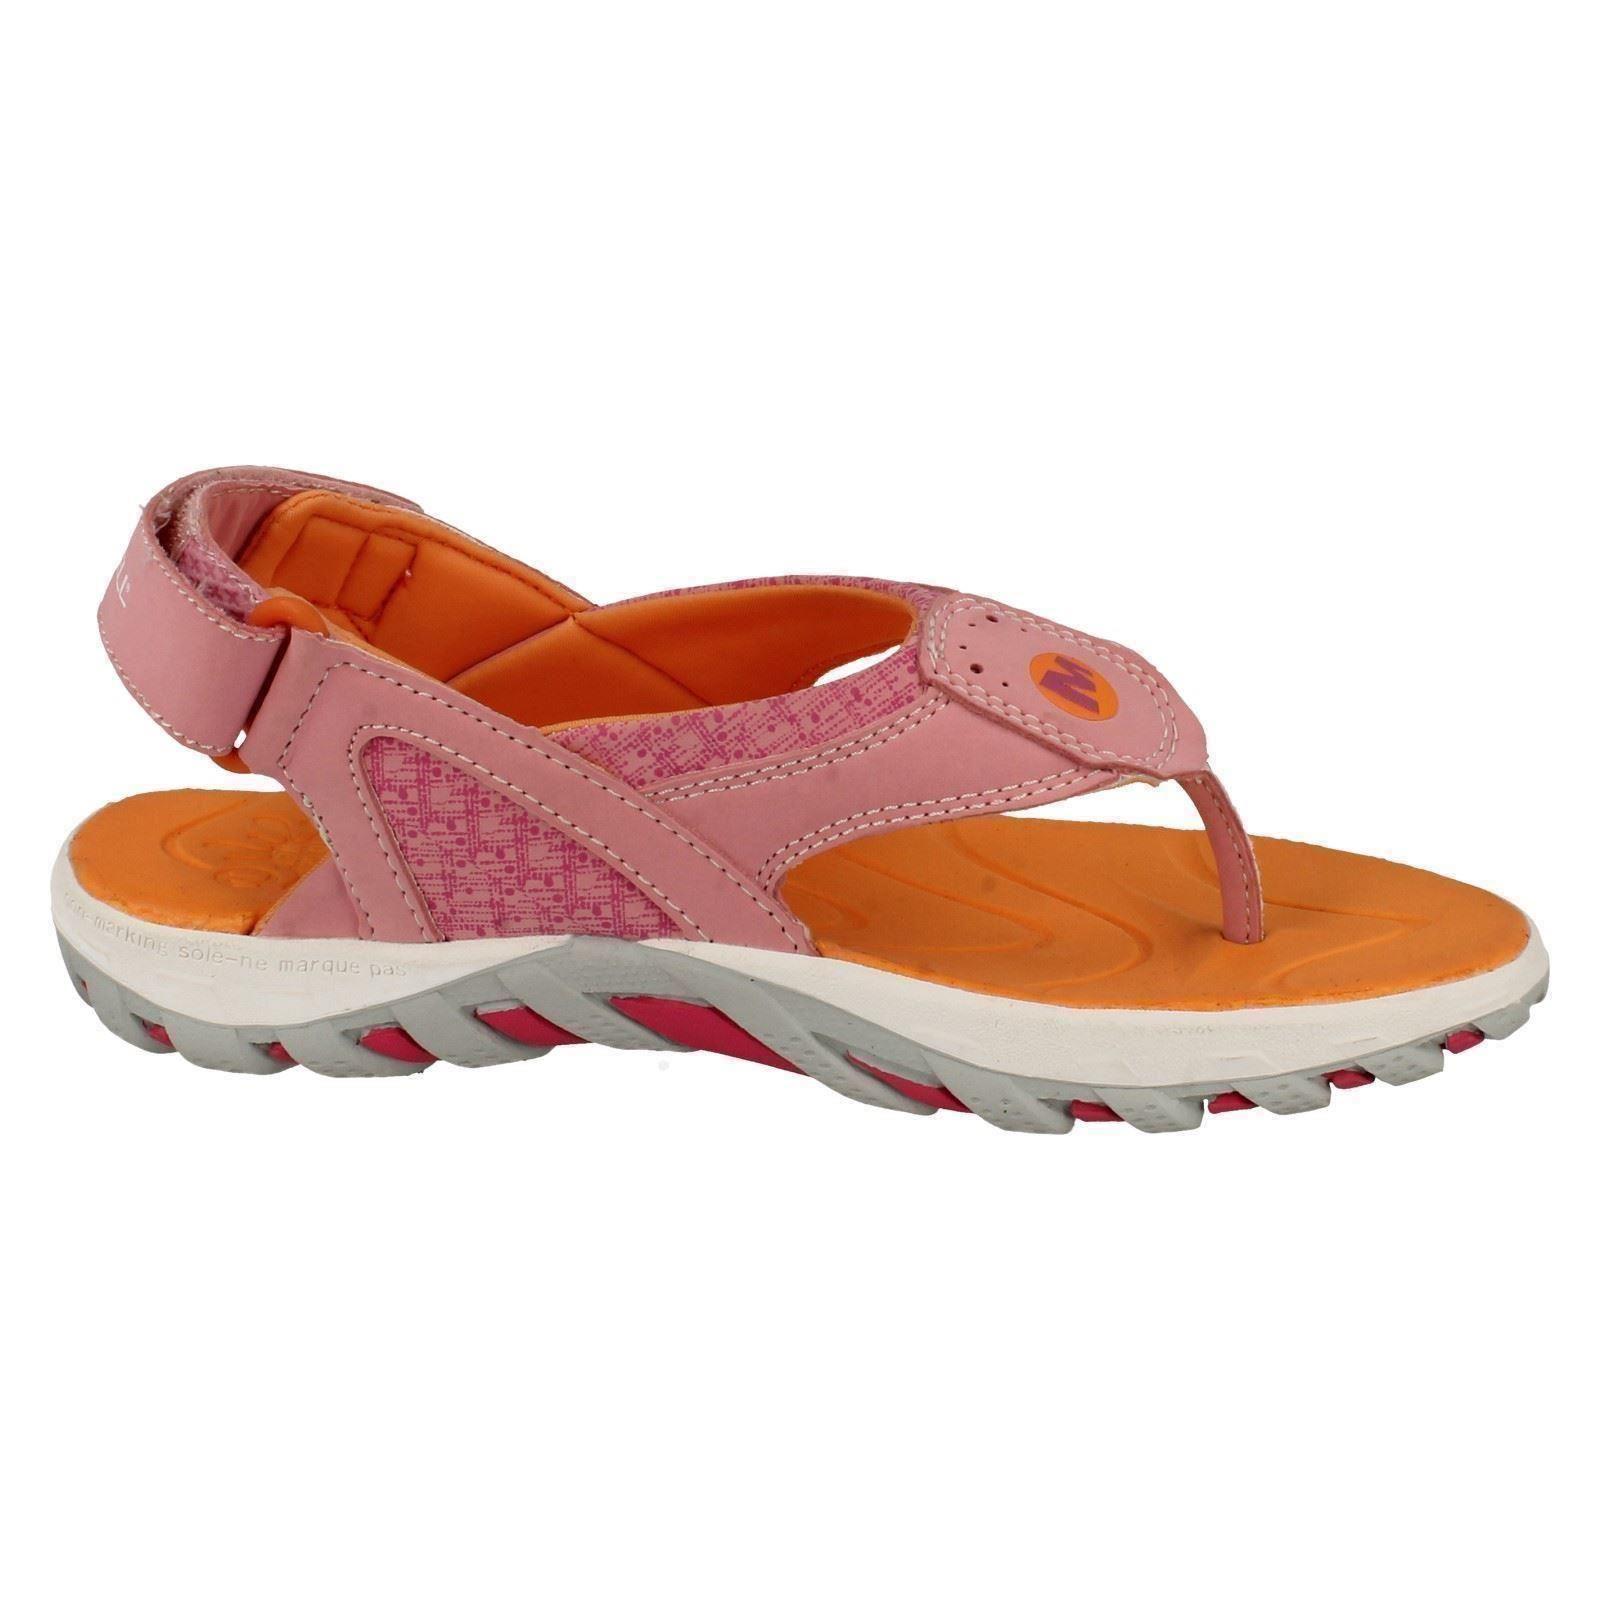 Girls Merrell Summer Toe Post Sandals Water Pro Plunge